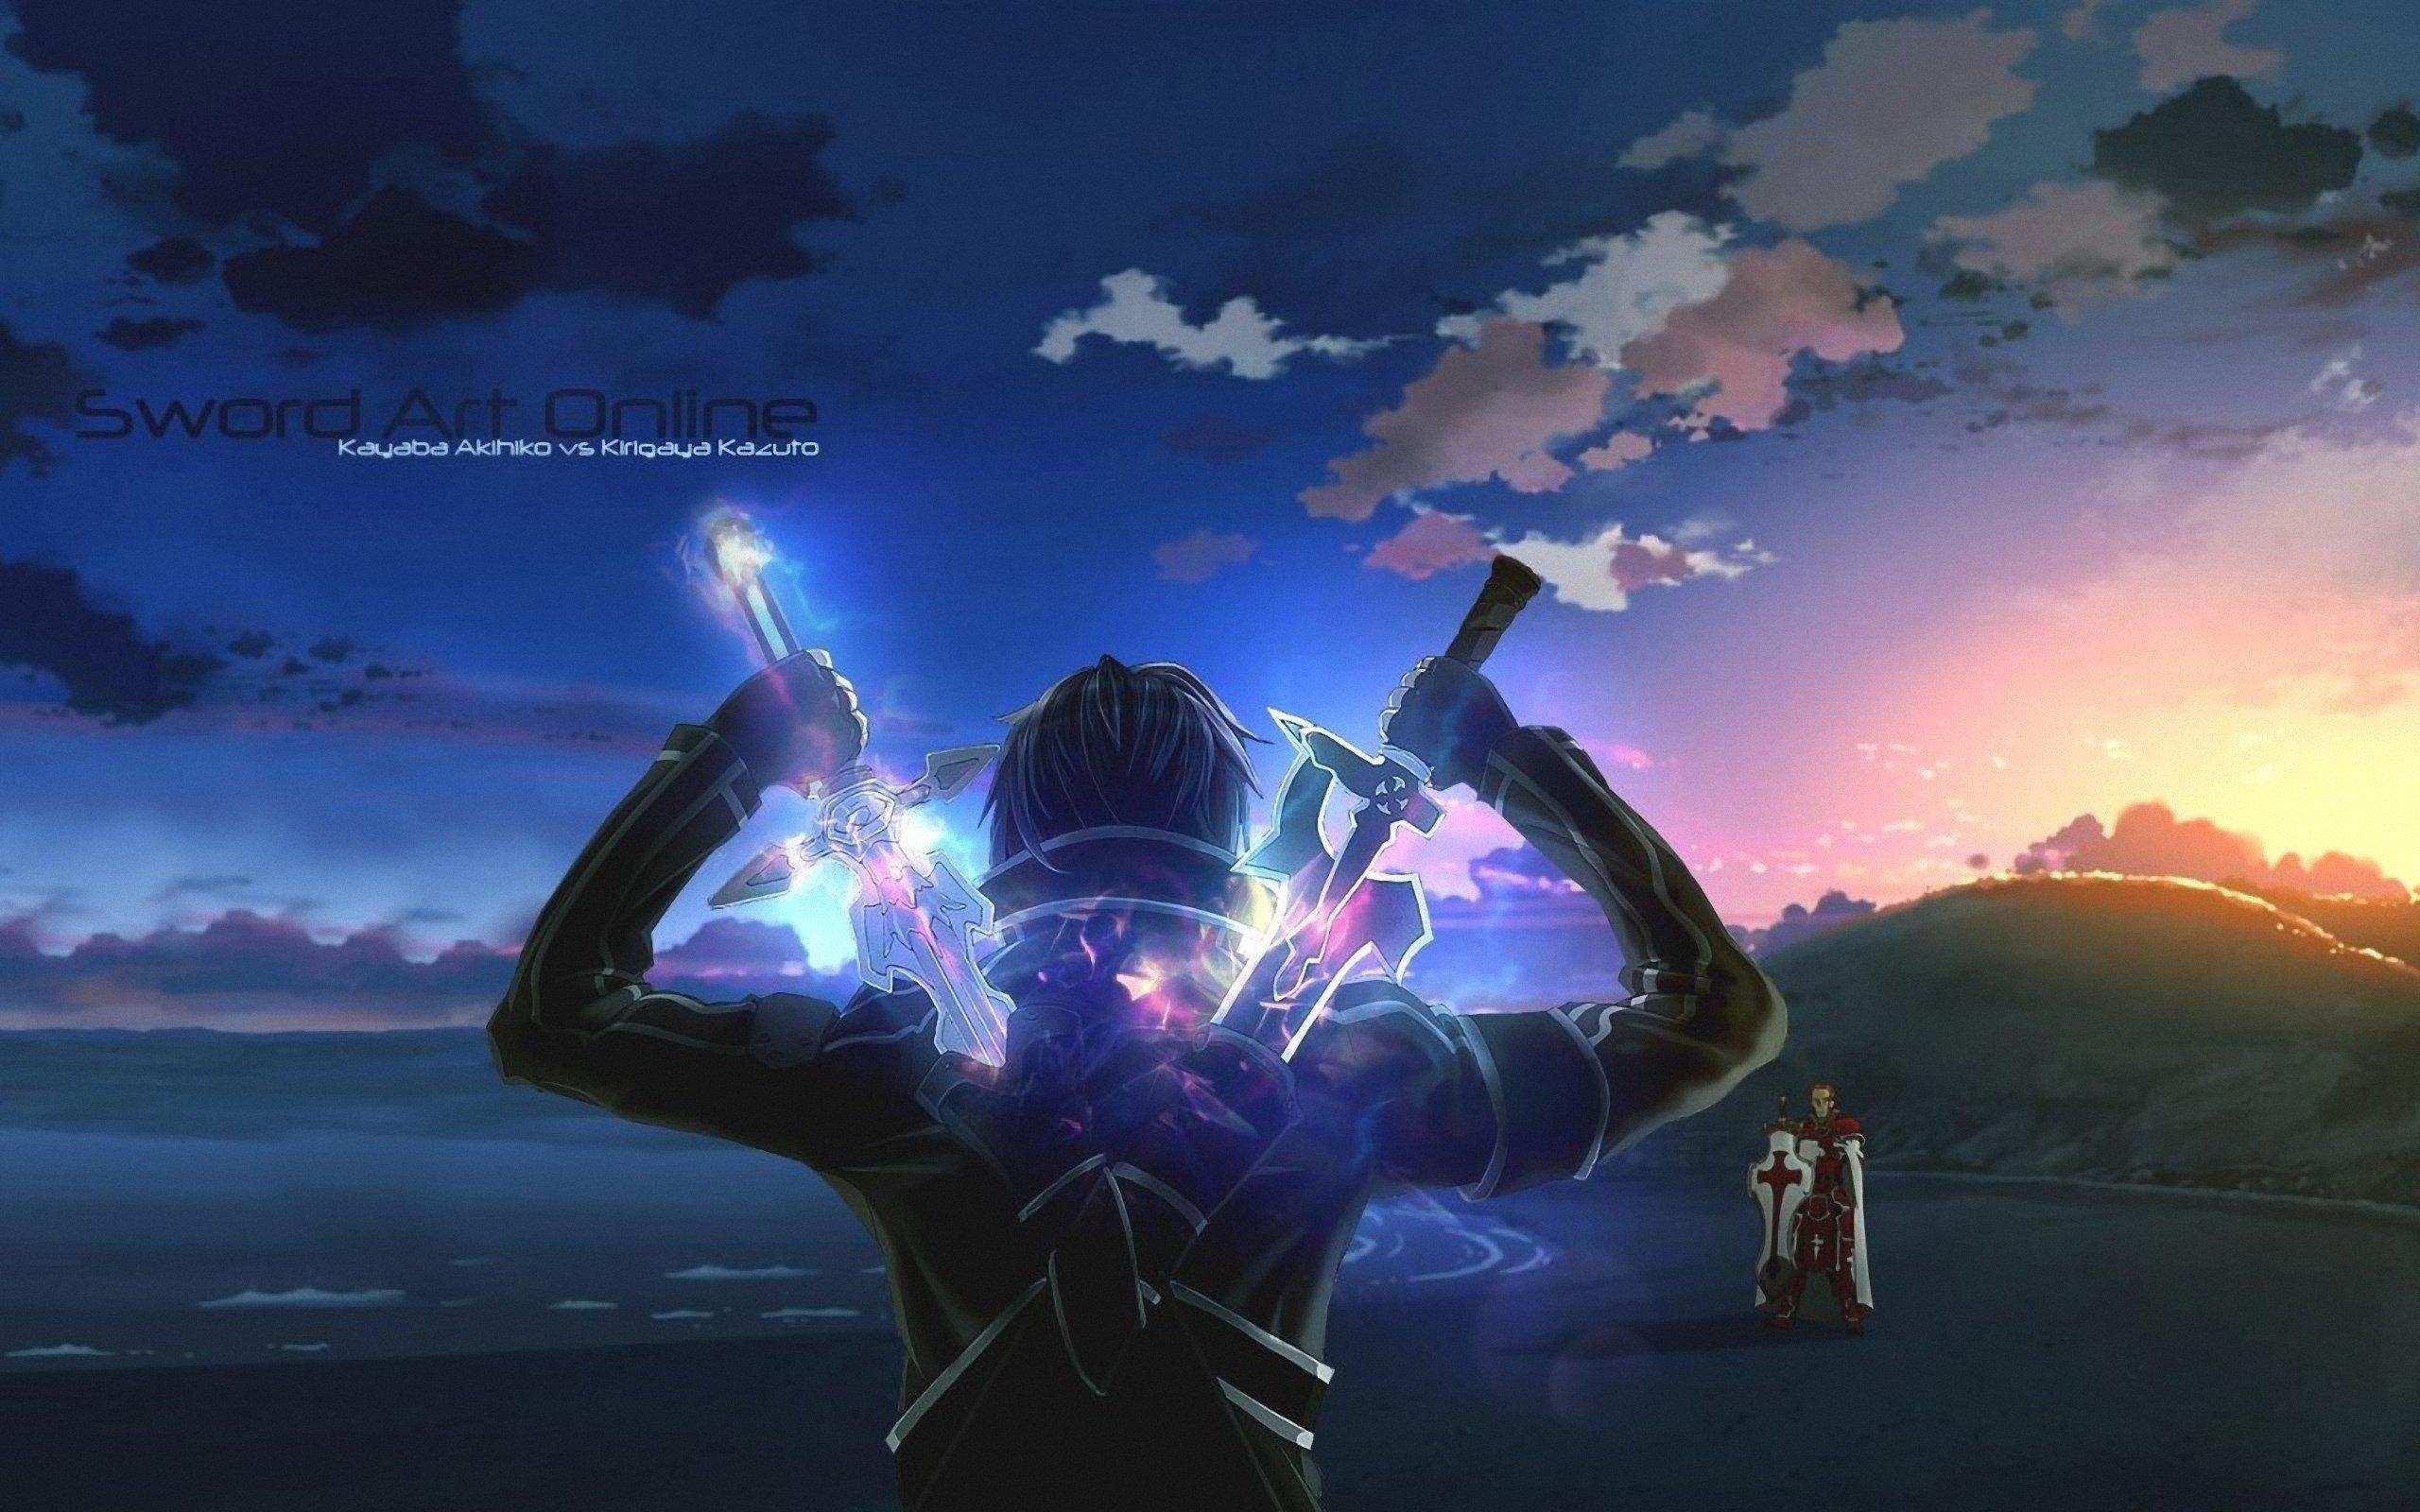 Wallpapers Sword Art Online HD 4K   Taringa 2560x1600